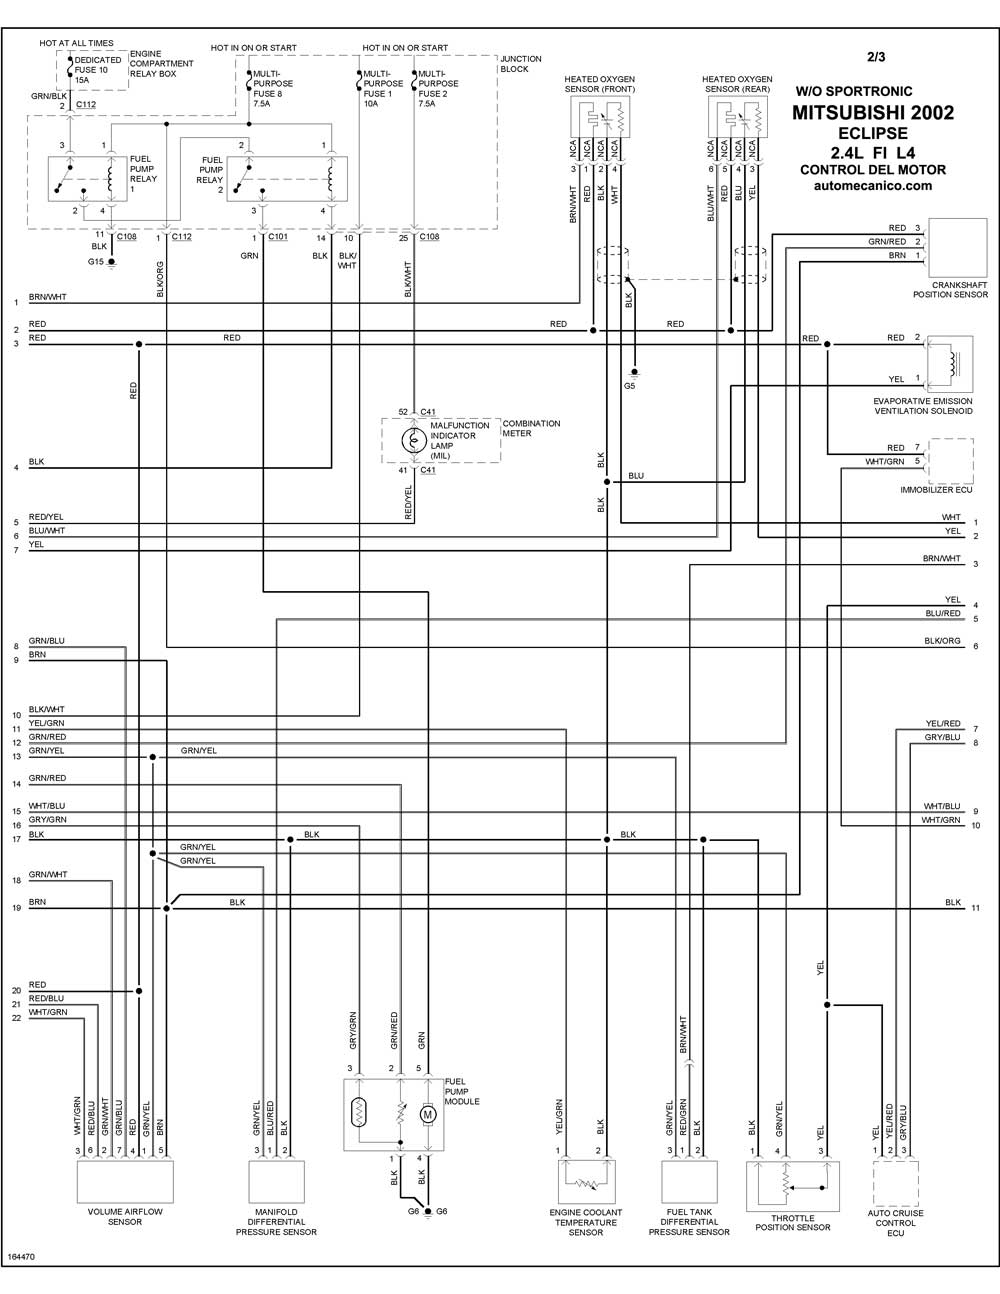 Mitsubishi-Diagramas-Graphics-2002